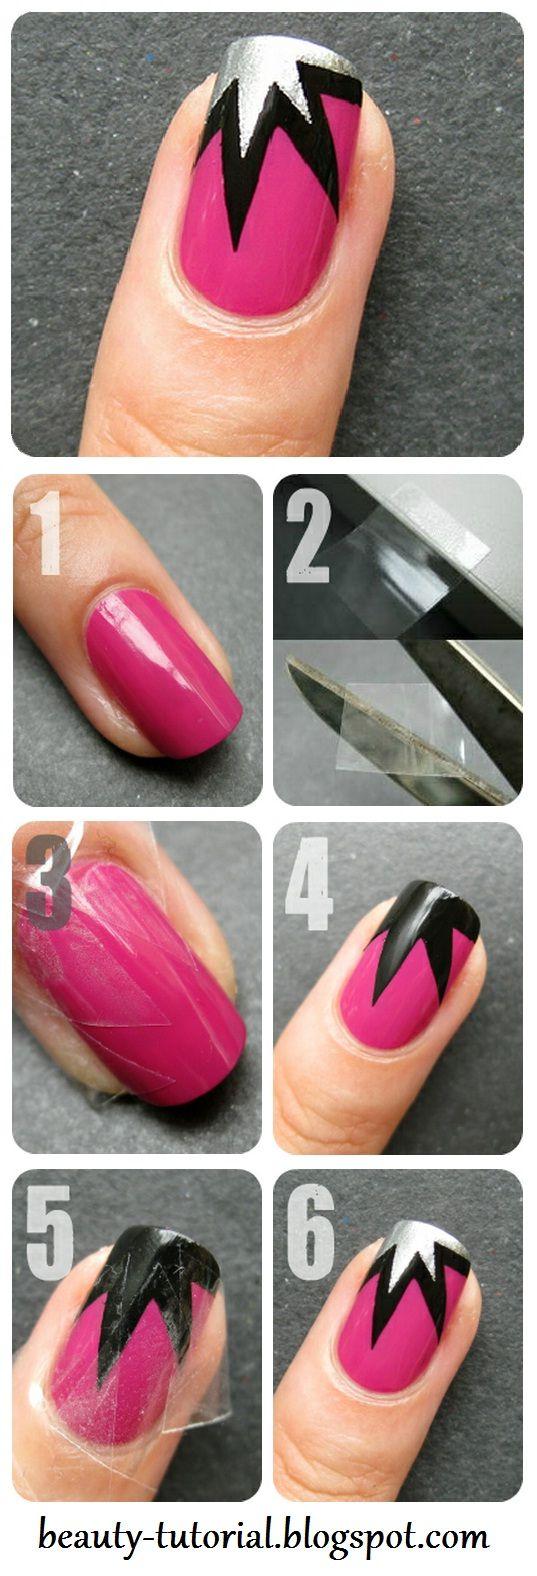 Explosion Nail Art Design Tape Manicure Tutorial - Nadyana Magazine